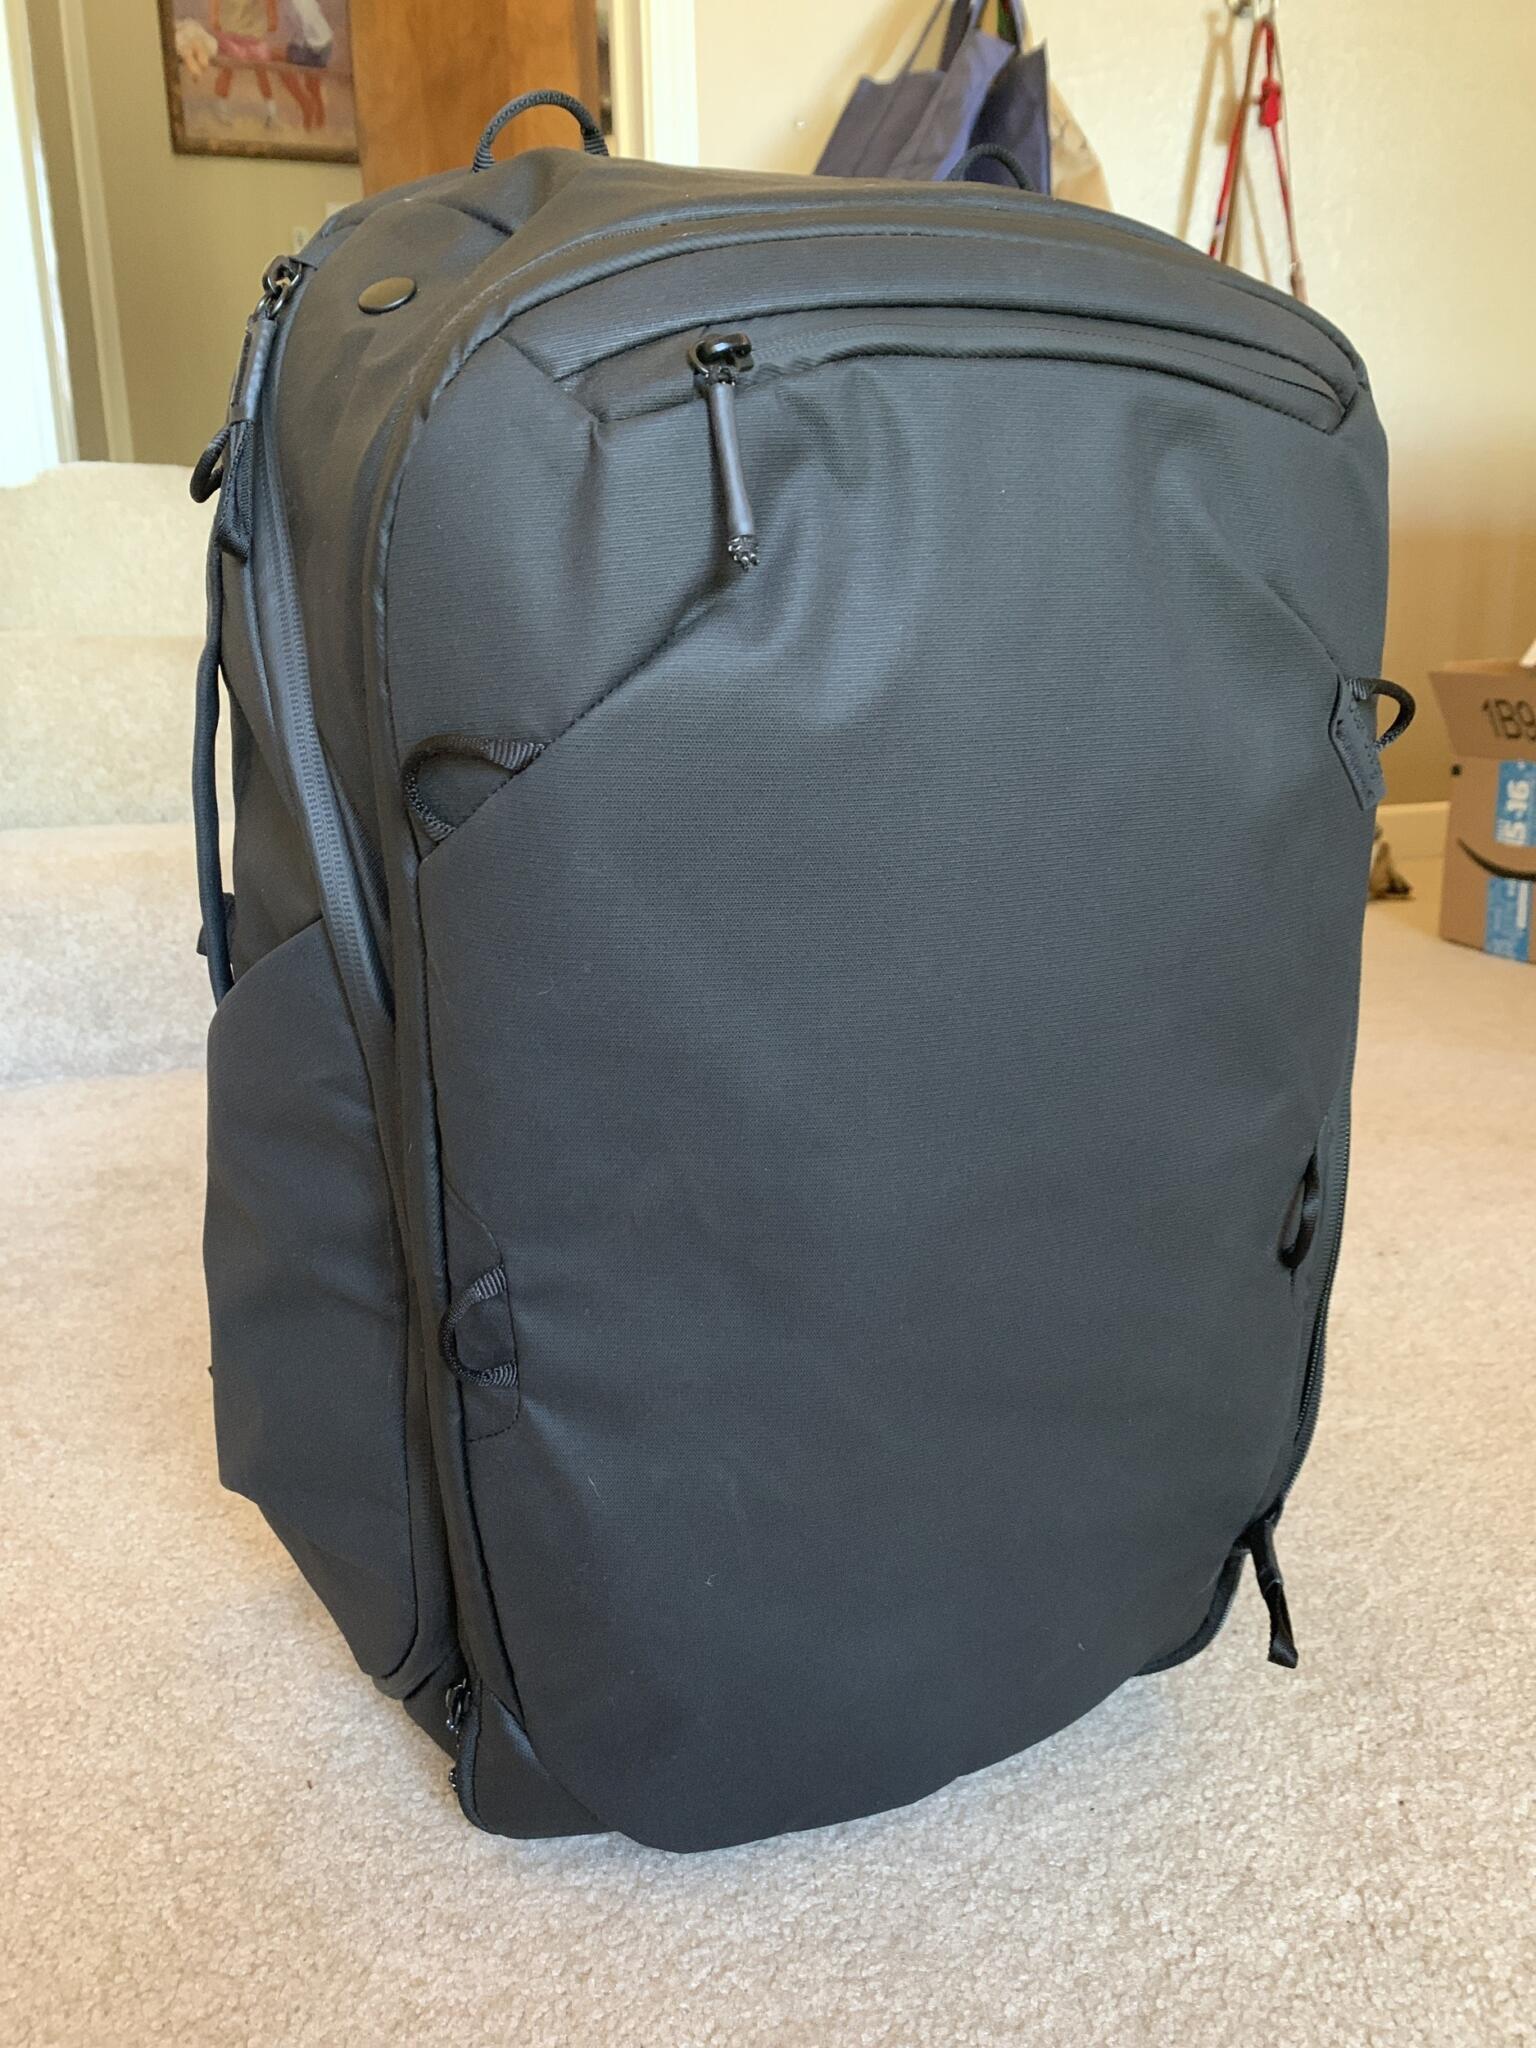 Peak Design travel backpack review